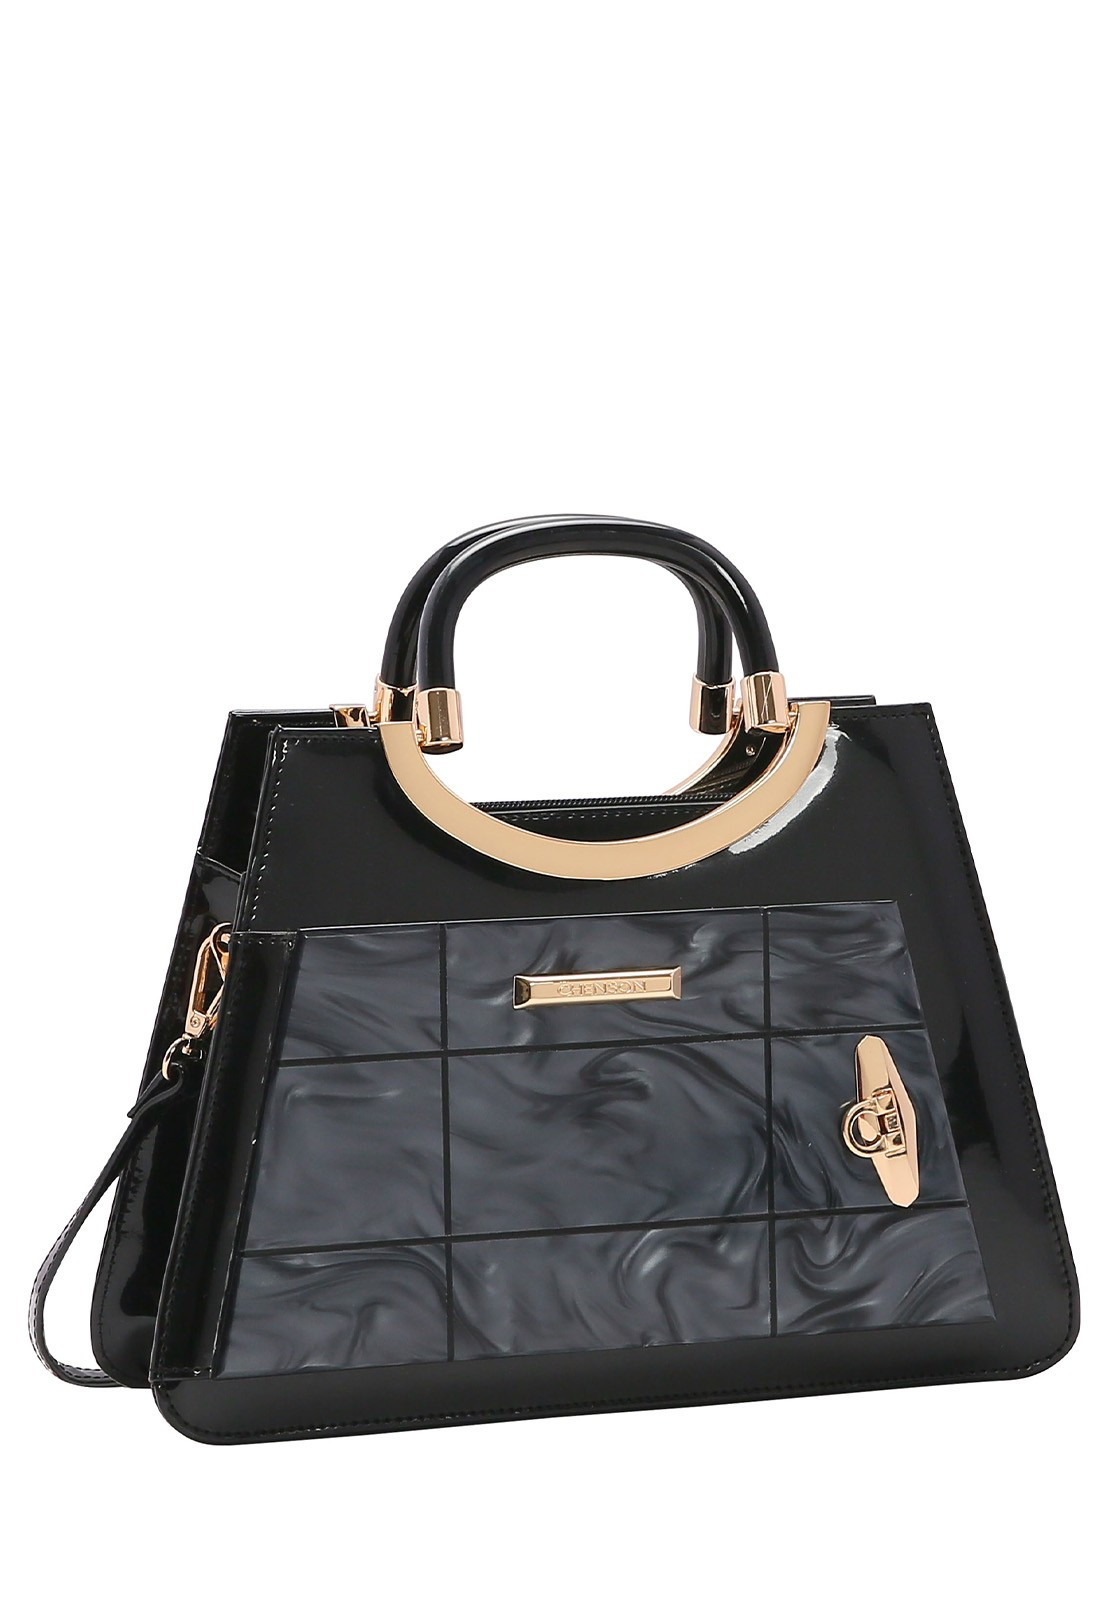 Bolsa Feminina Chenson Glamour Marmorizadode Mão 3483025